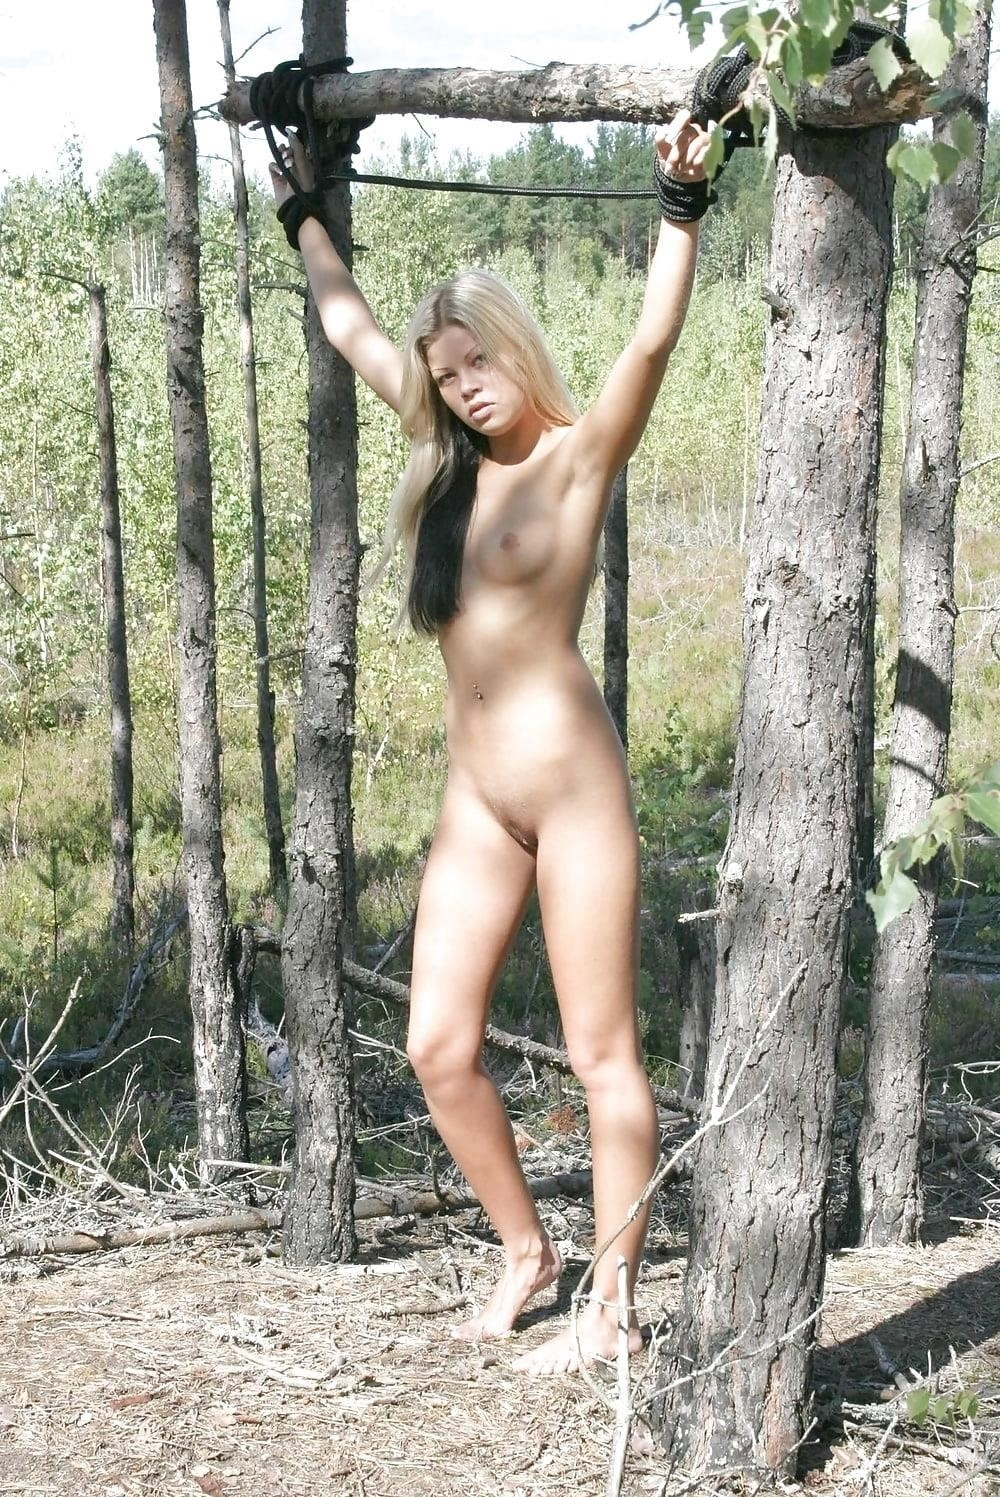 Milf bdsm outdoor-6436